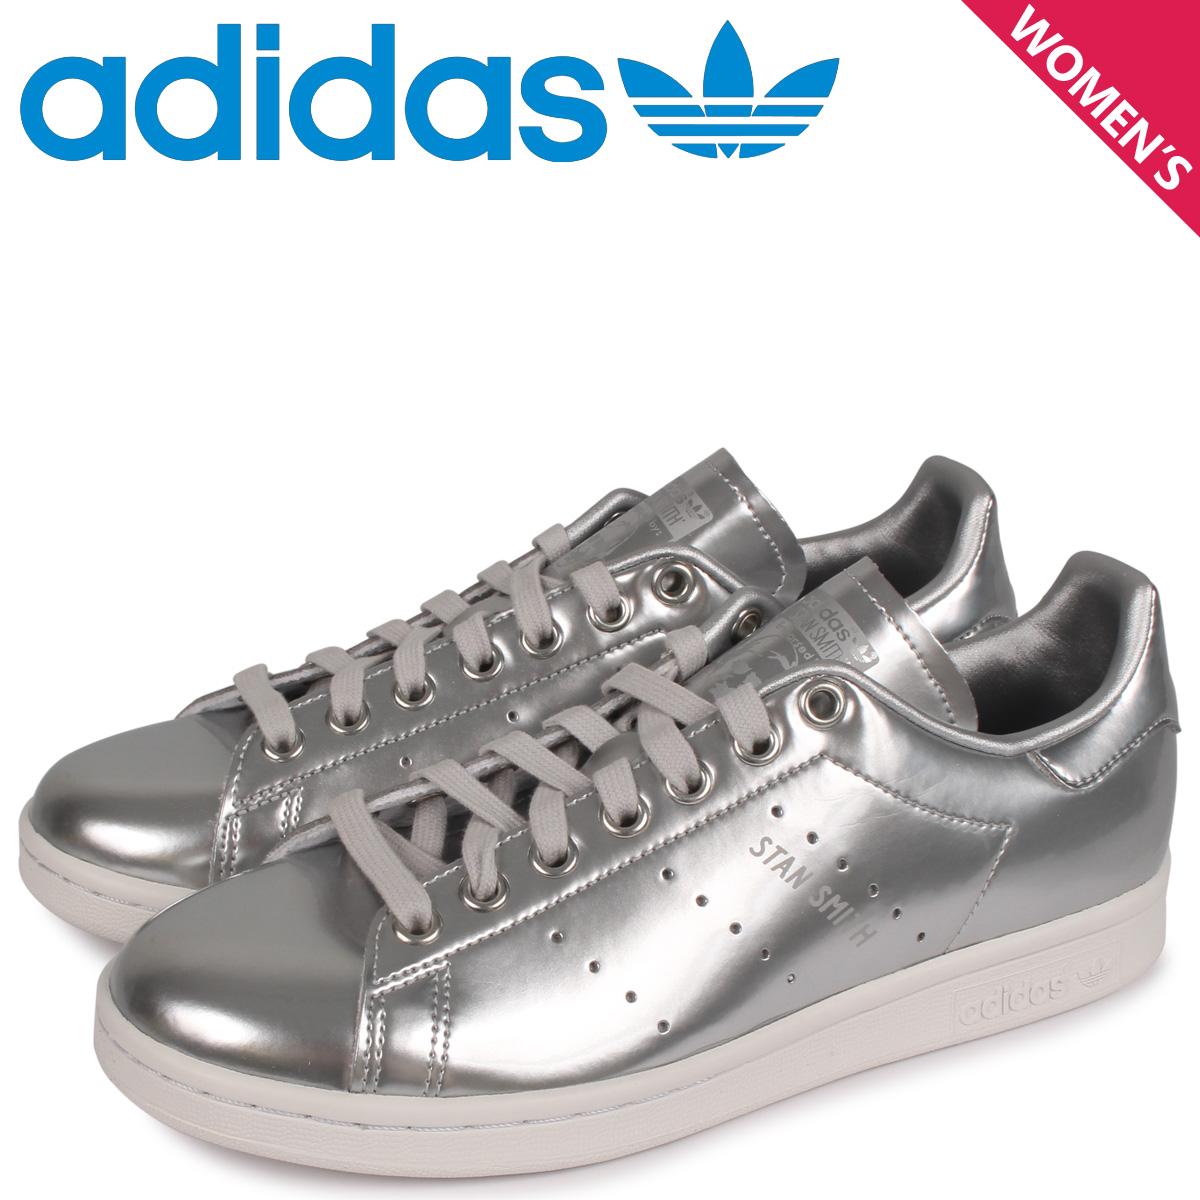 adidas Originals アディダス オリジナルス スタンスミス スニーカー レディース STAN SMITH W シルバー FW5477